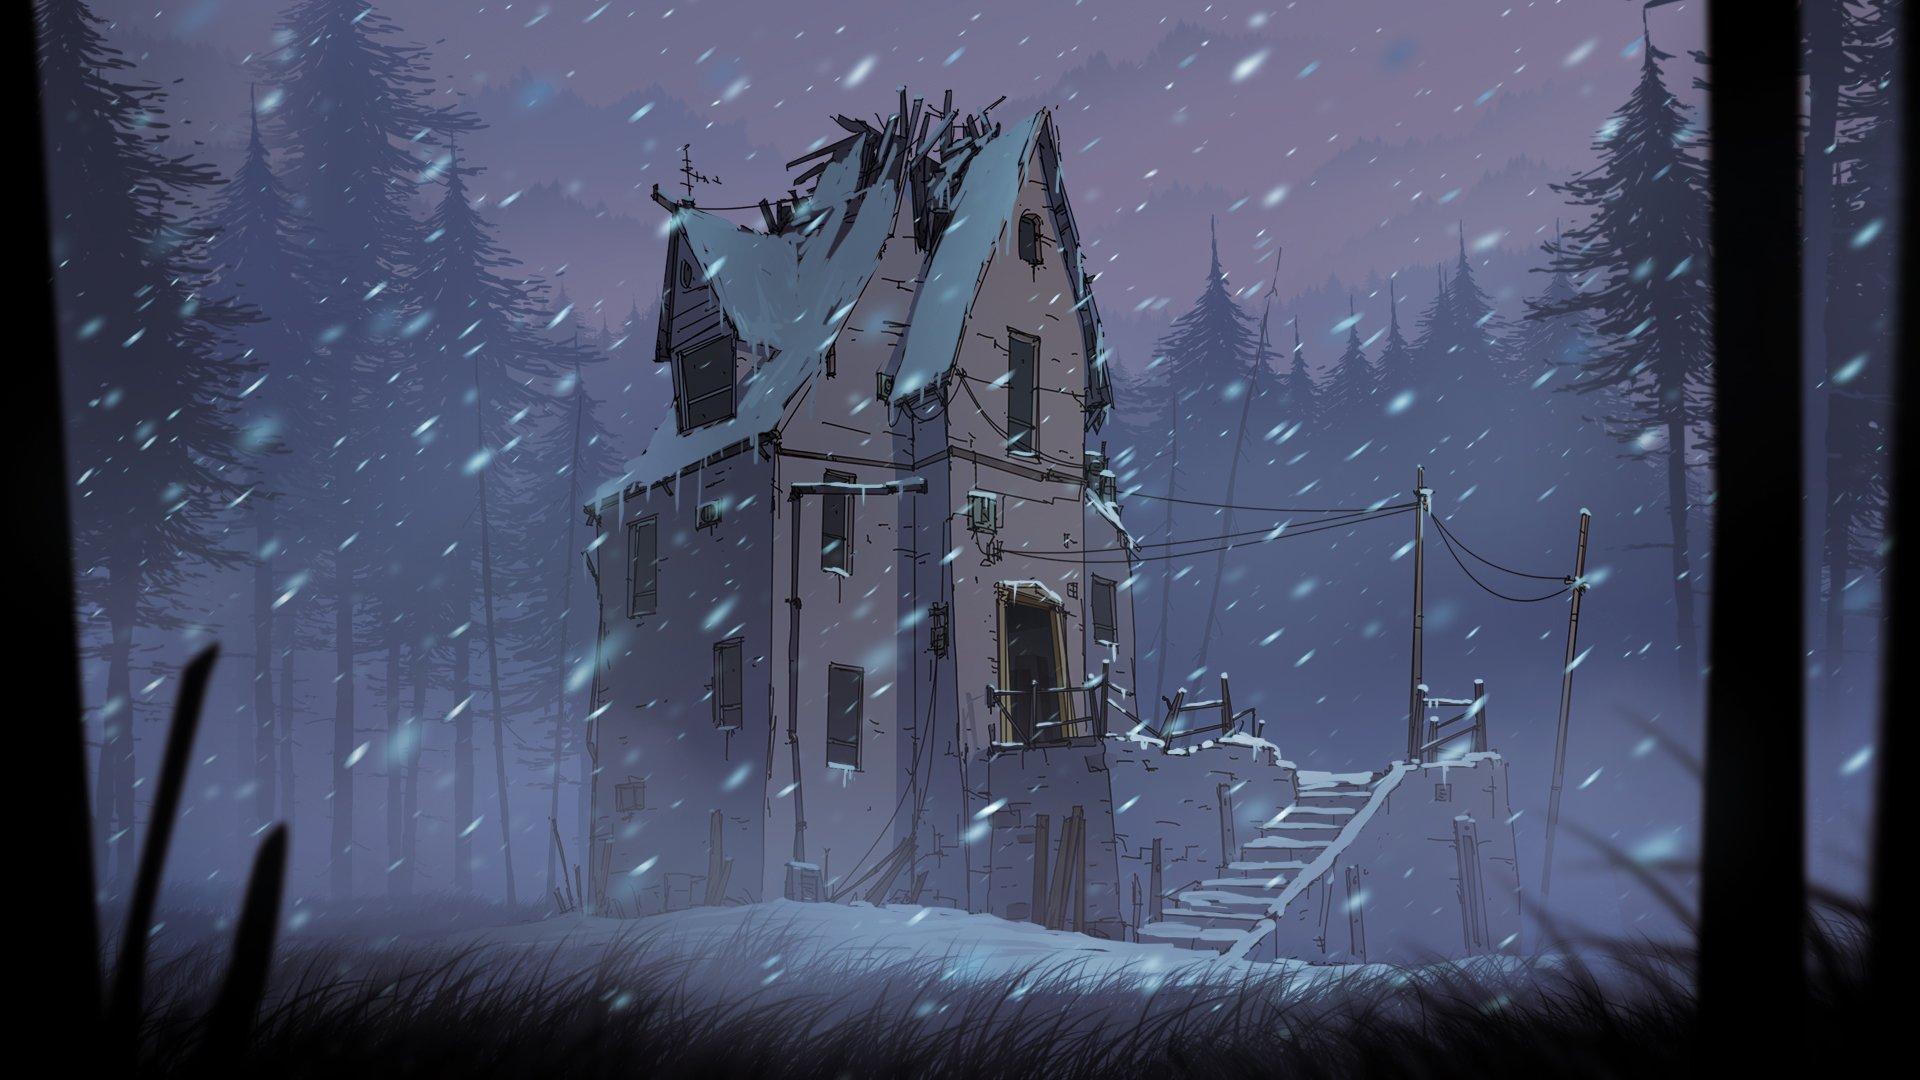 Yelltown in Winter